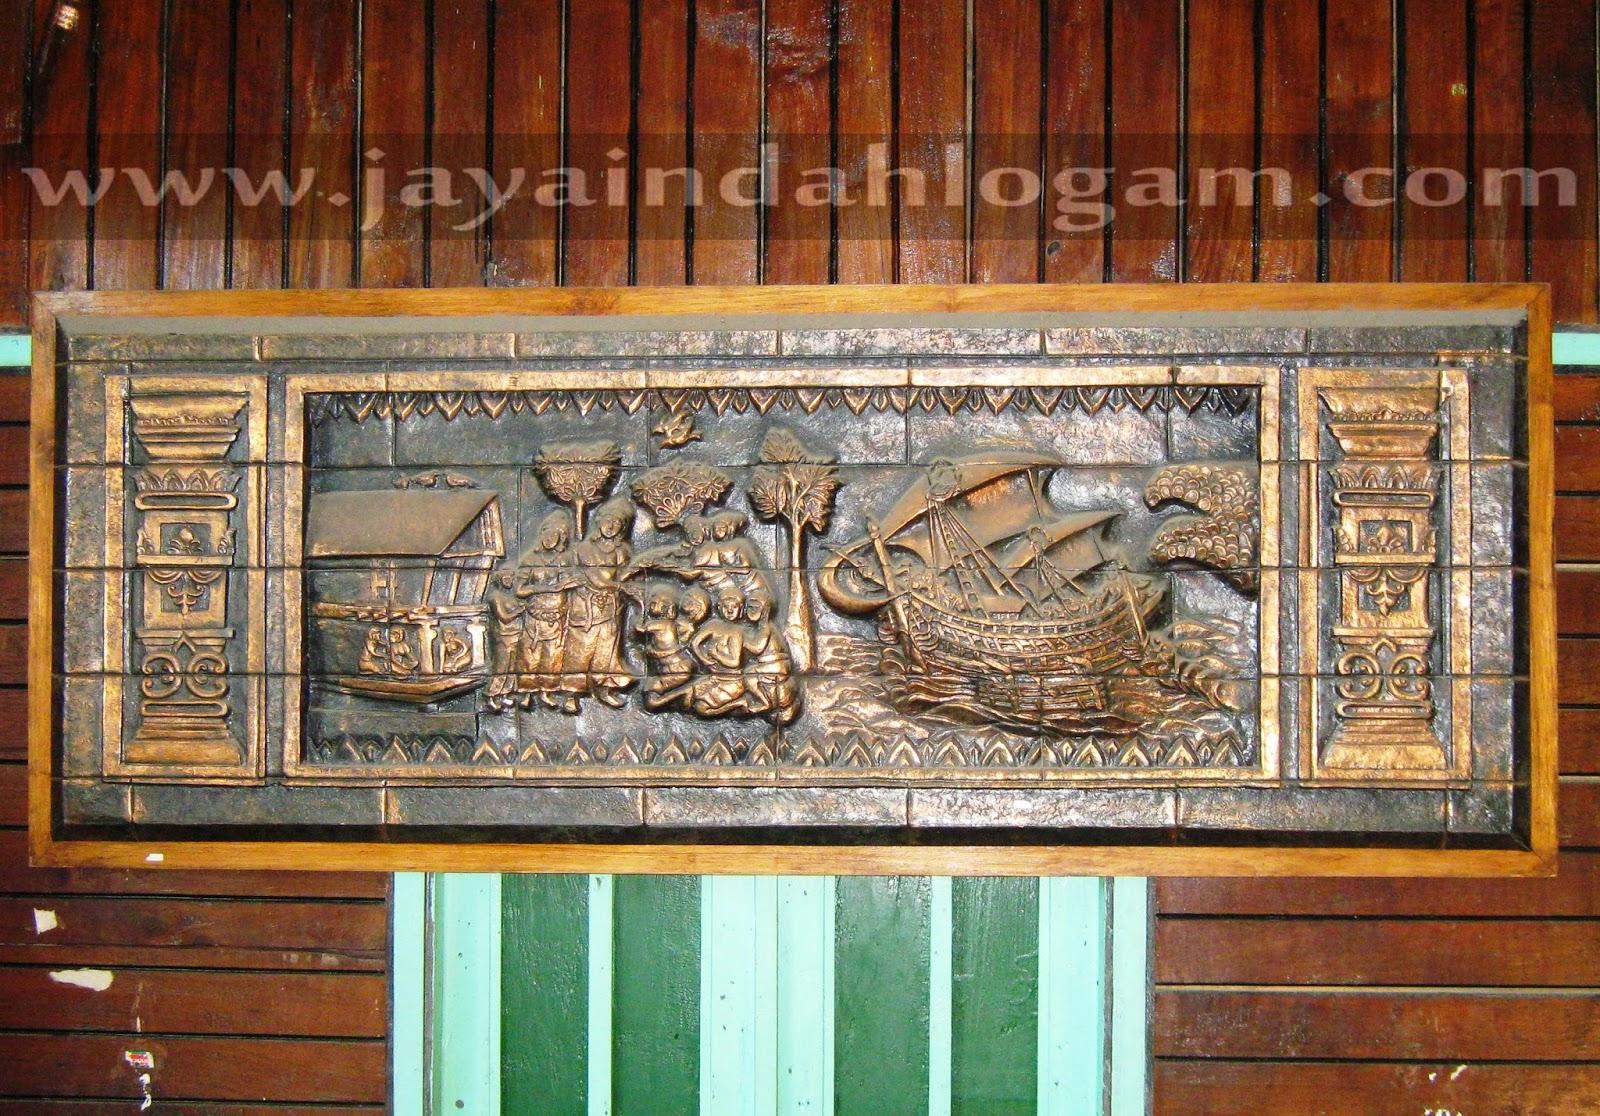 http://www.jayaindahlogam.com/2014/08/kerajinan-logam-relief.html